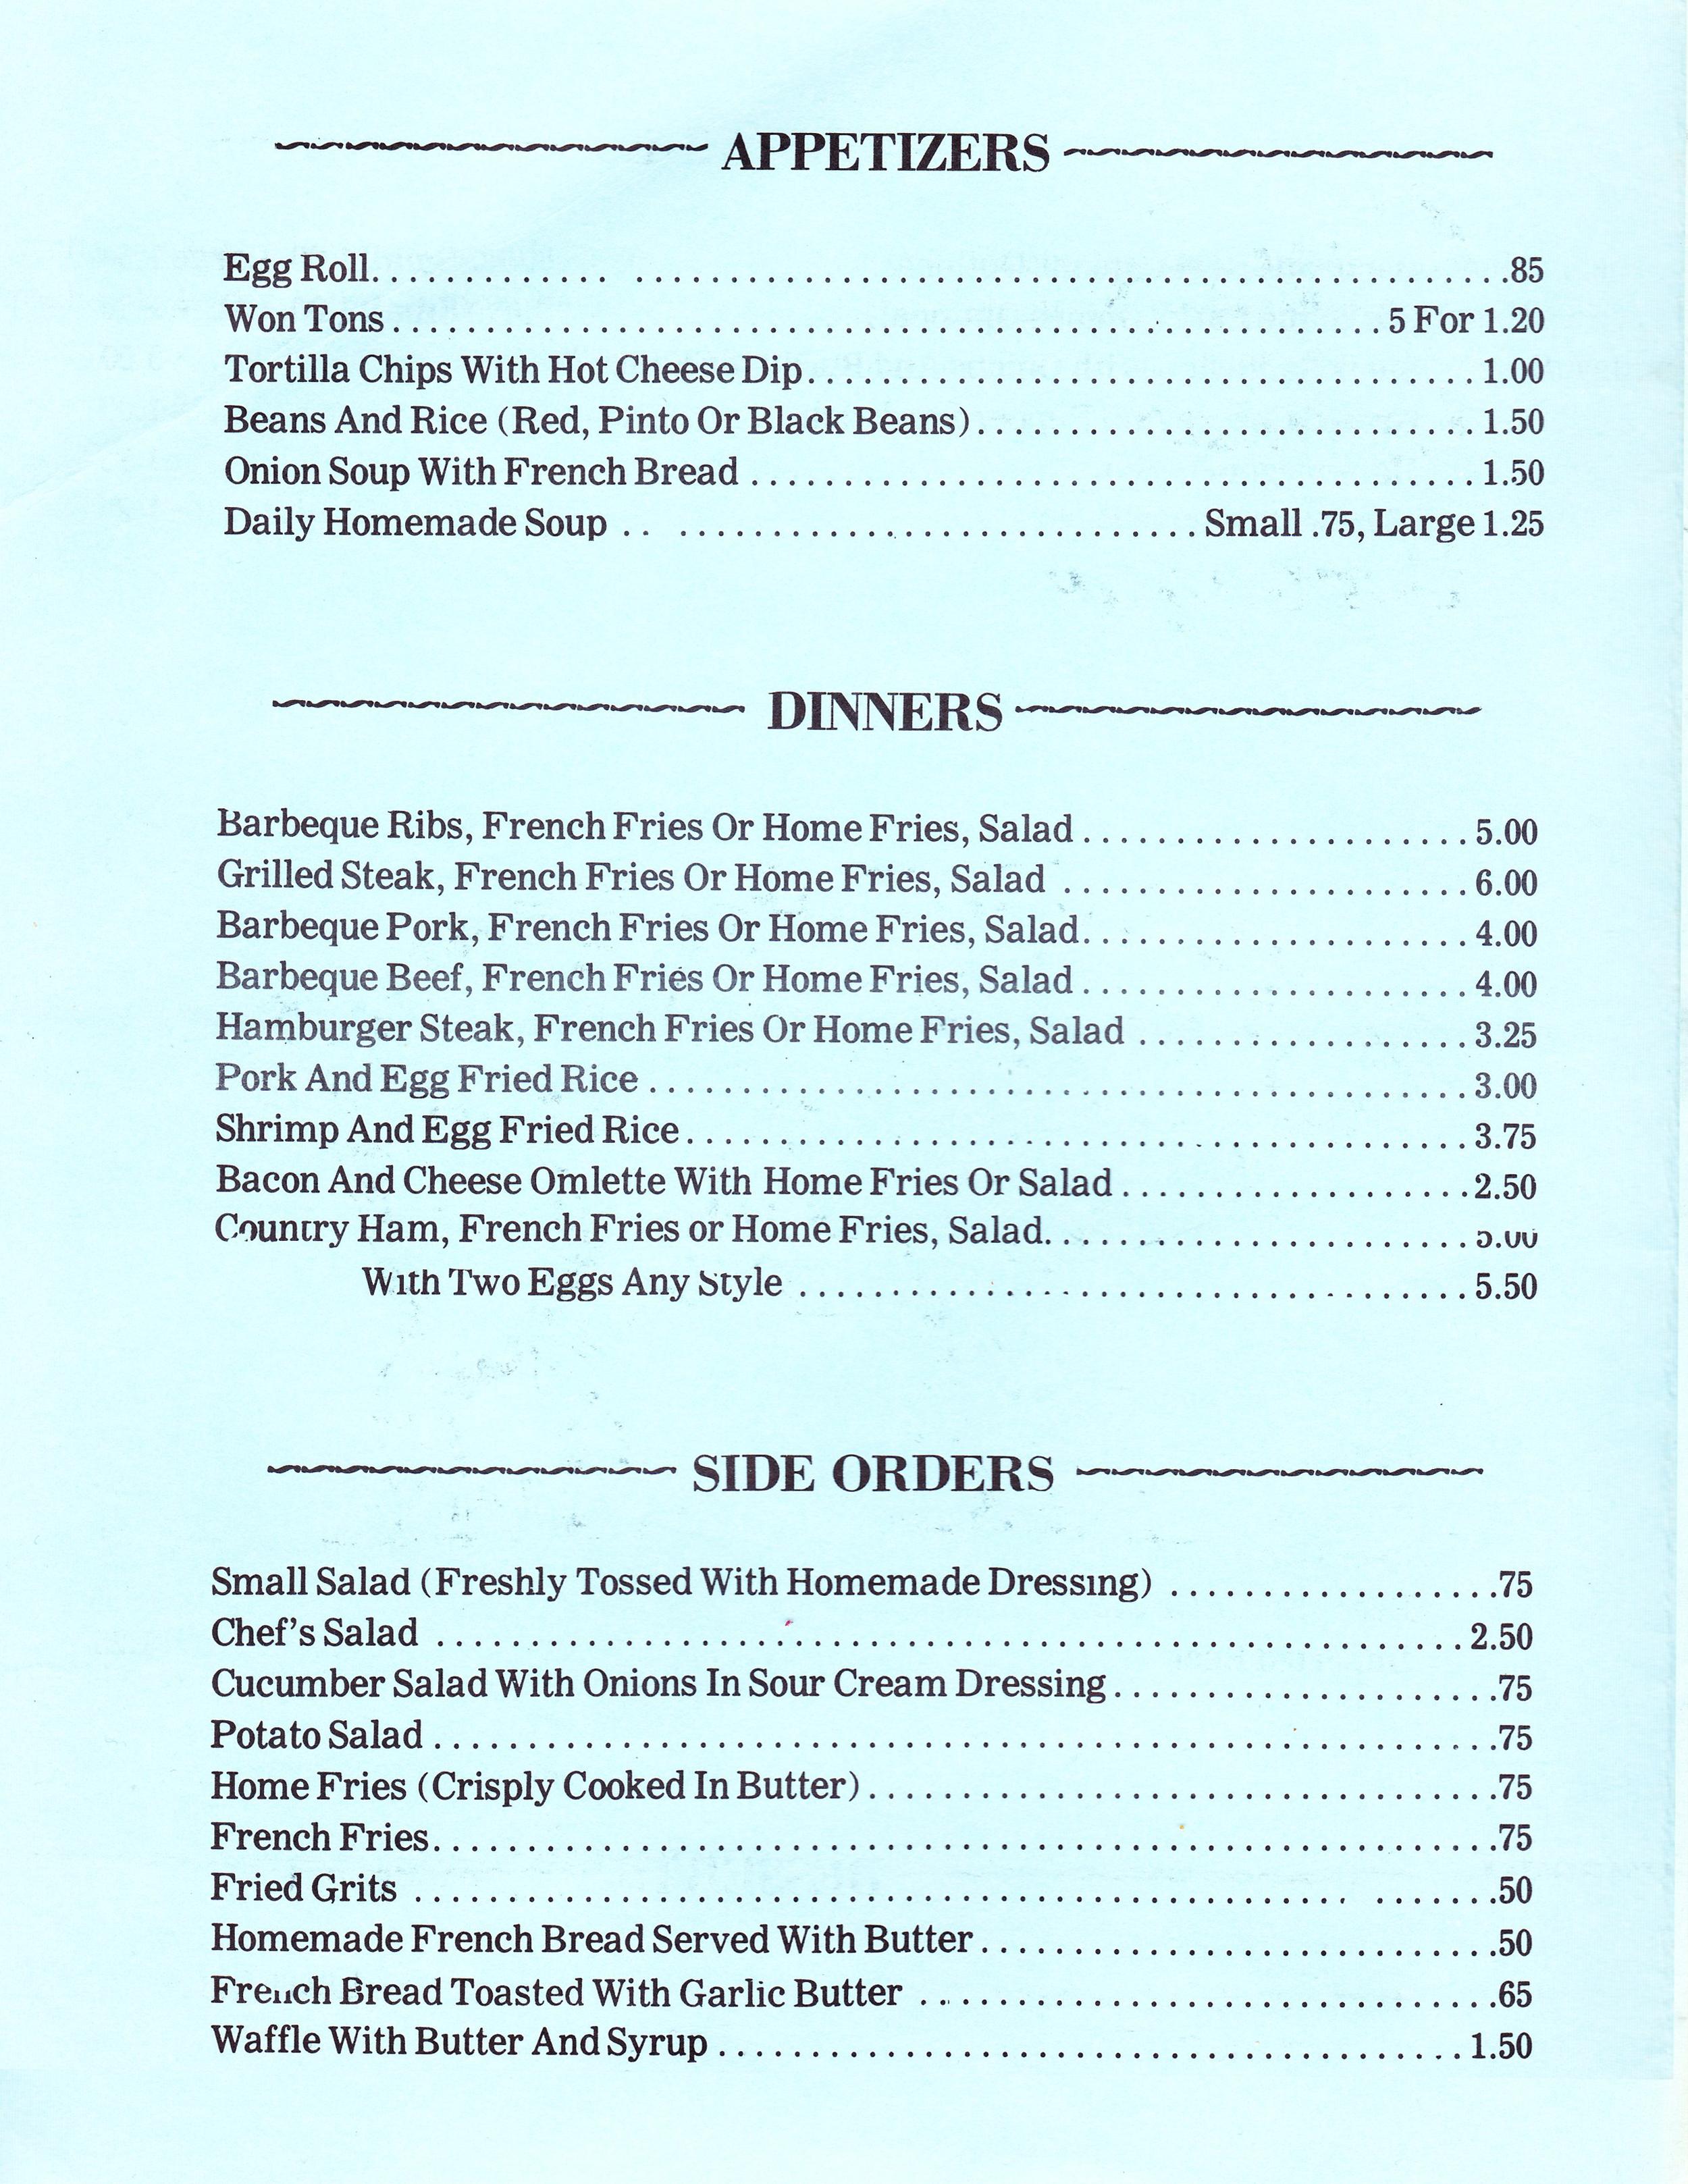 The original Cuz's menu from 1979.